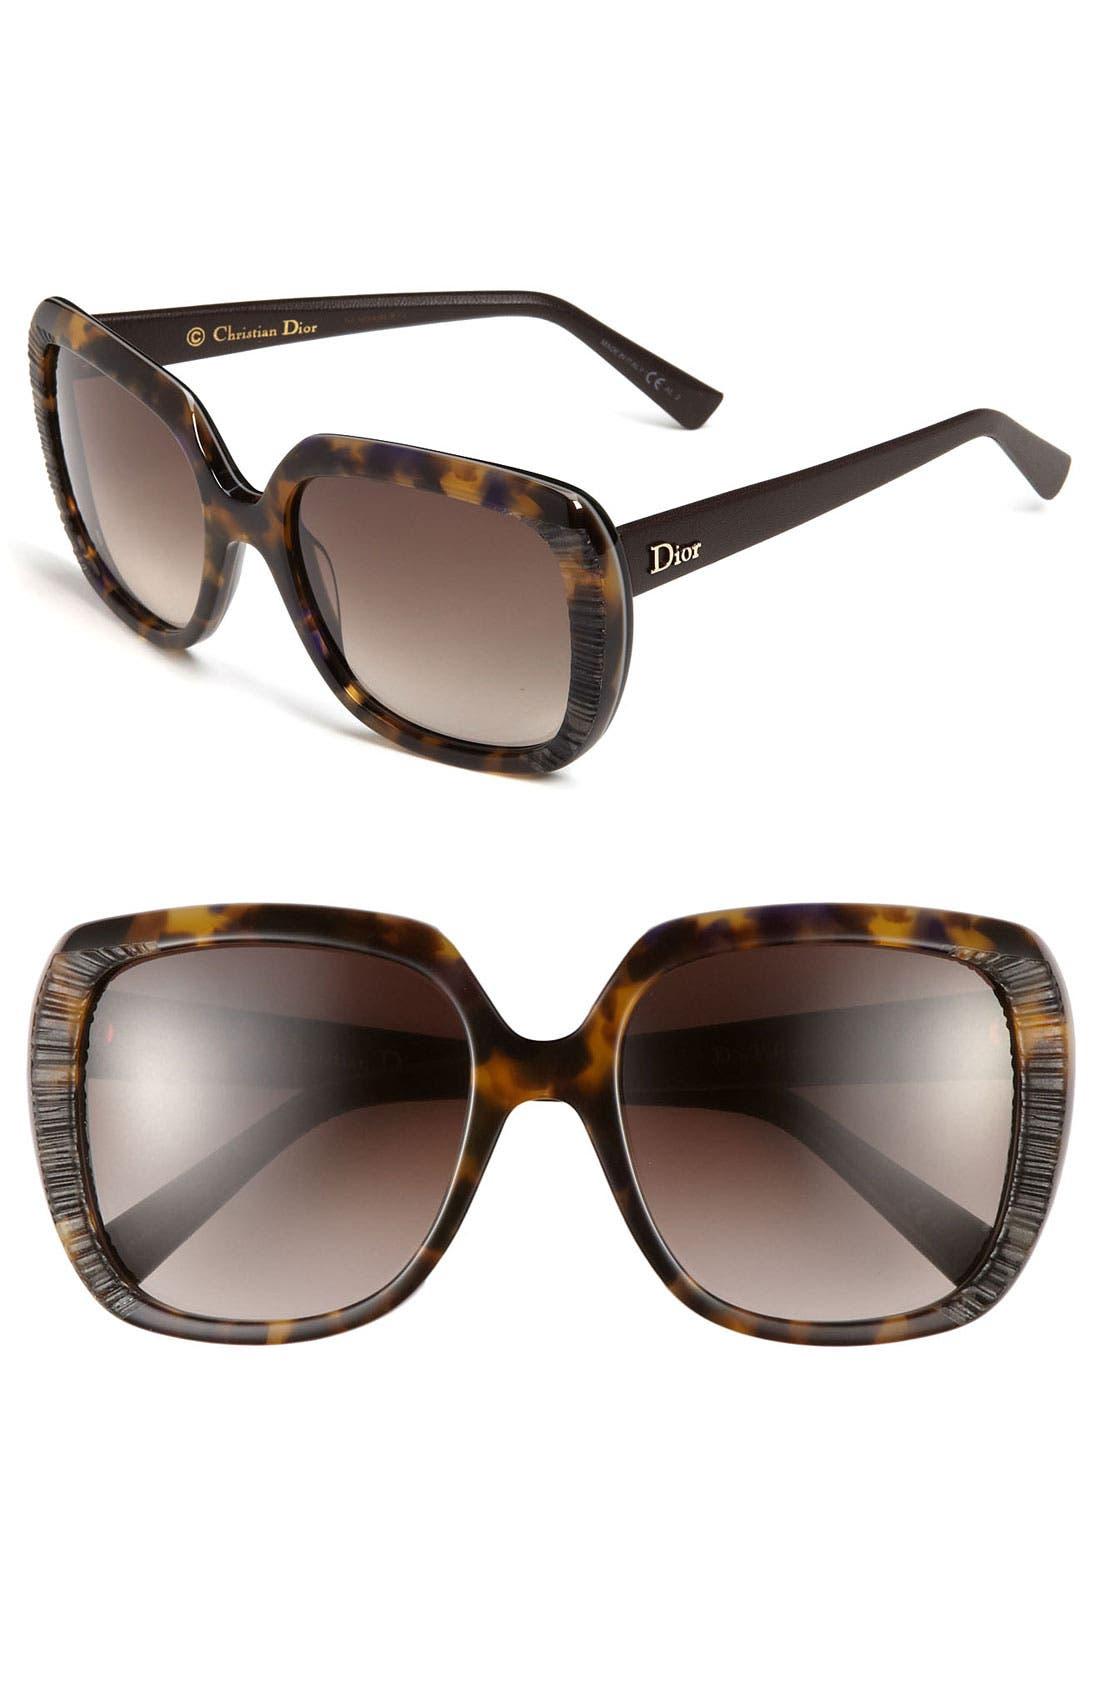 Main Image - Dior 'Taffetas' 59mm Sunglasses